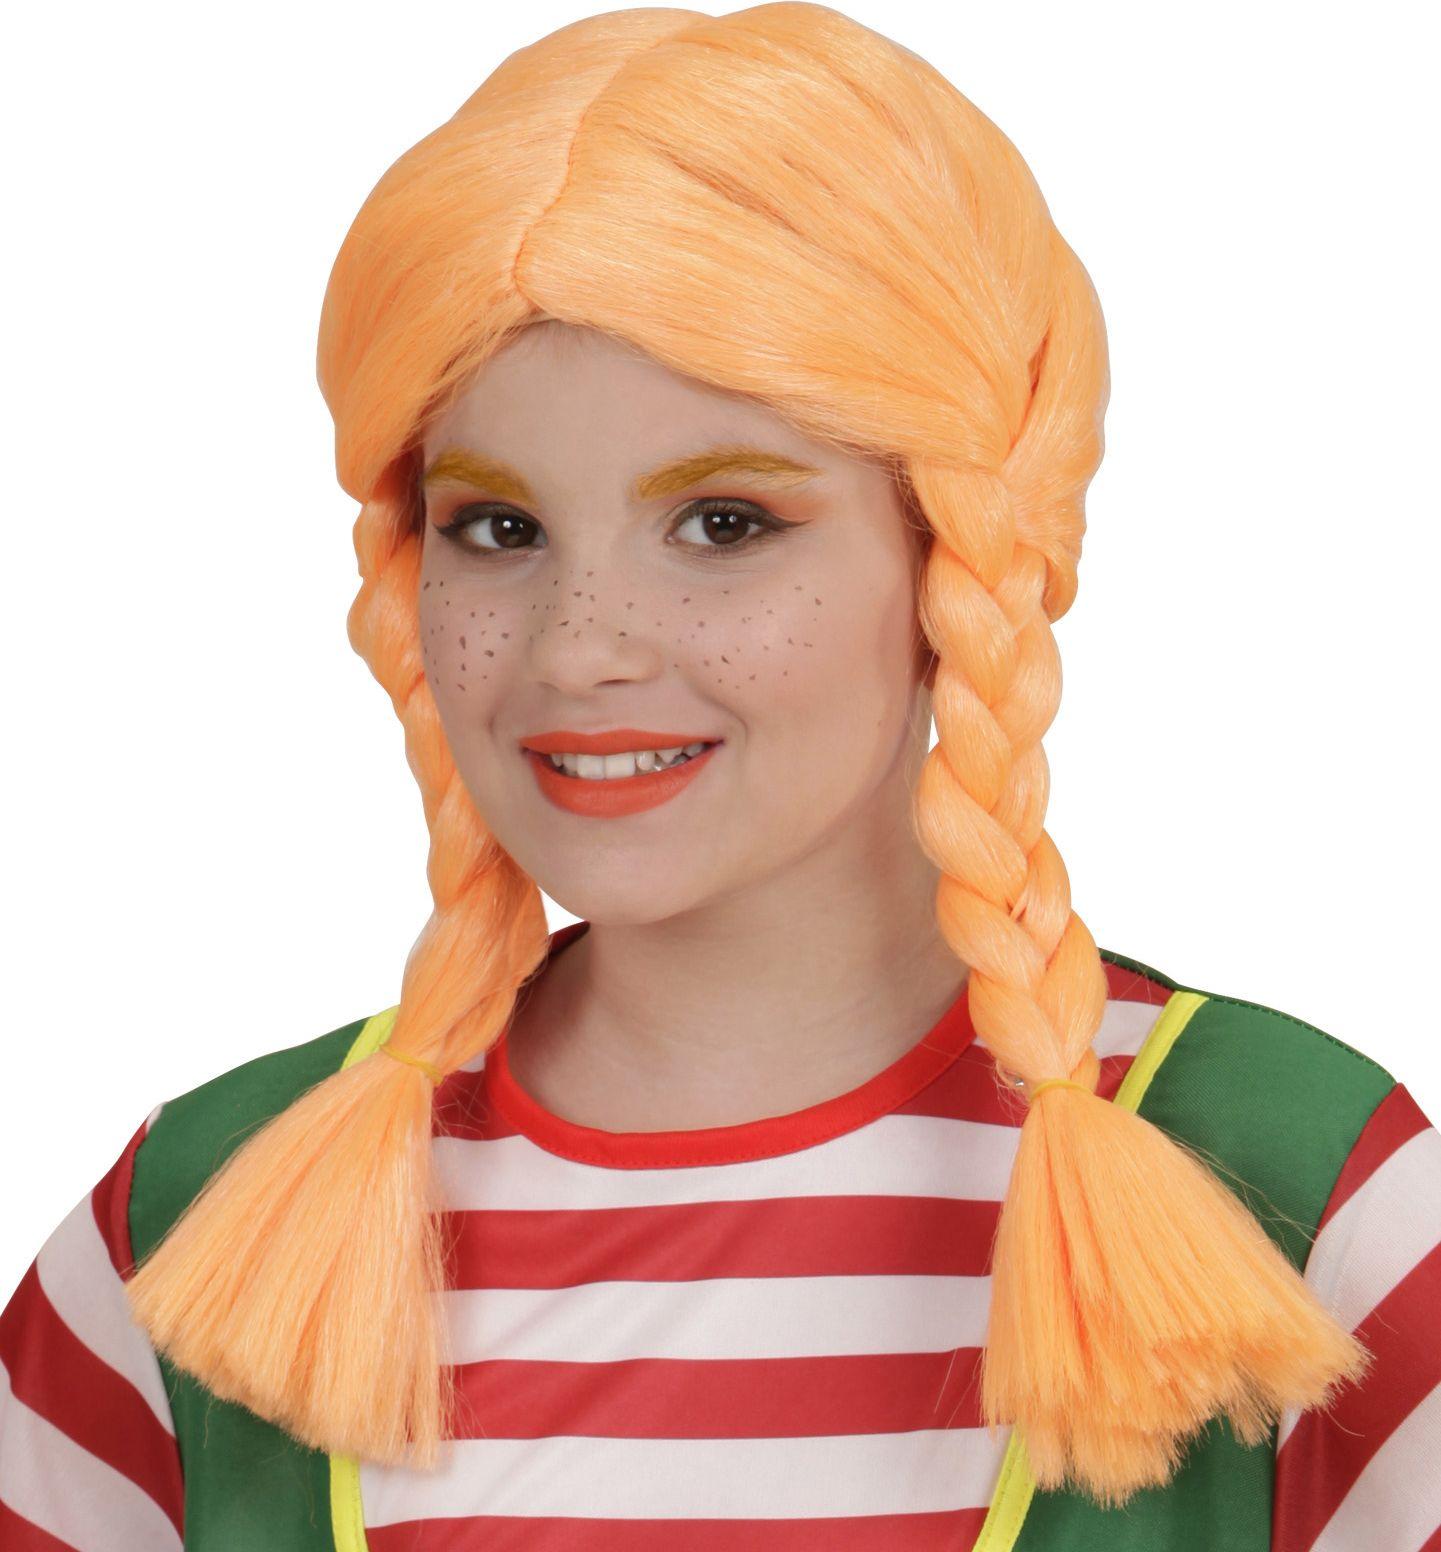 Oranje Pippi Langkous pruik kind